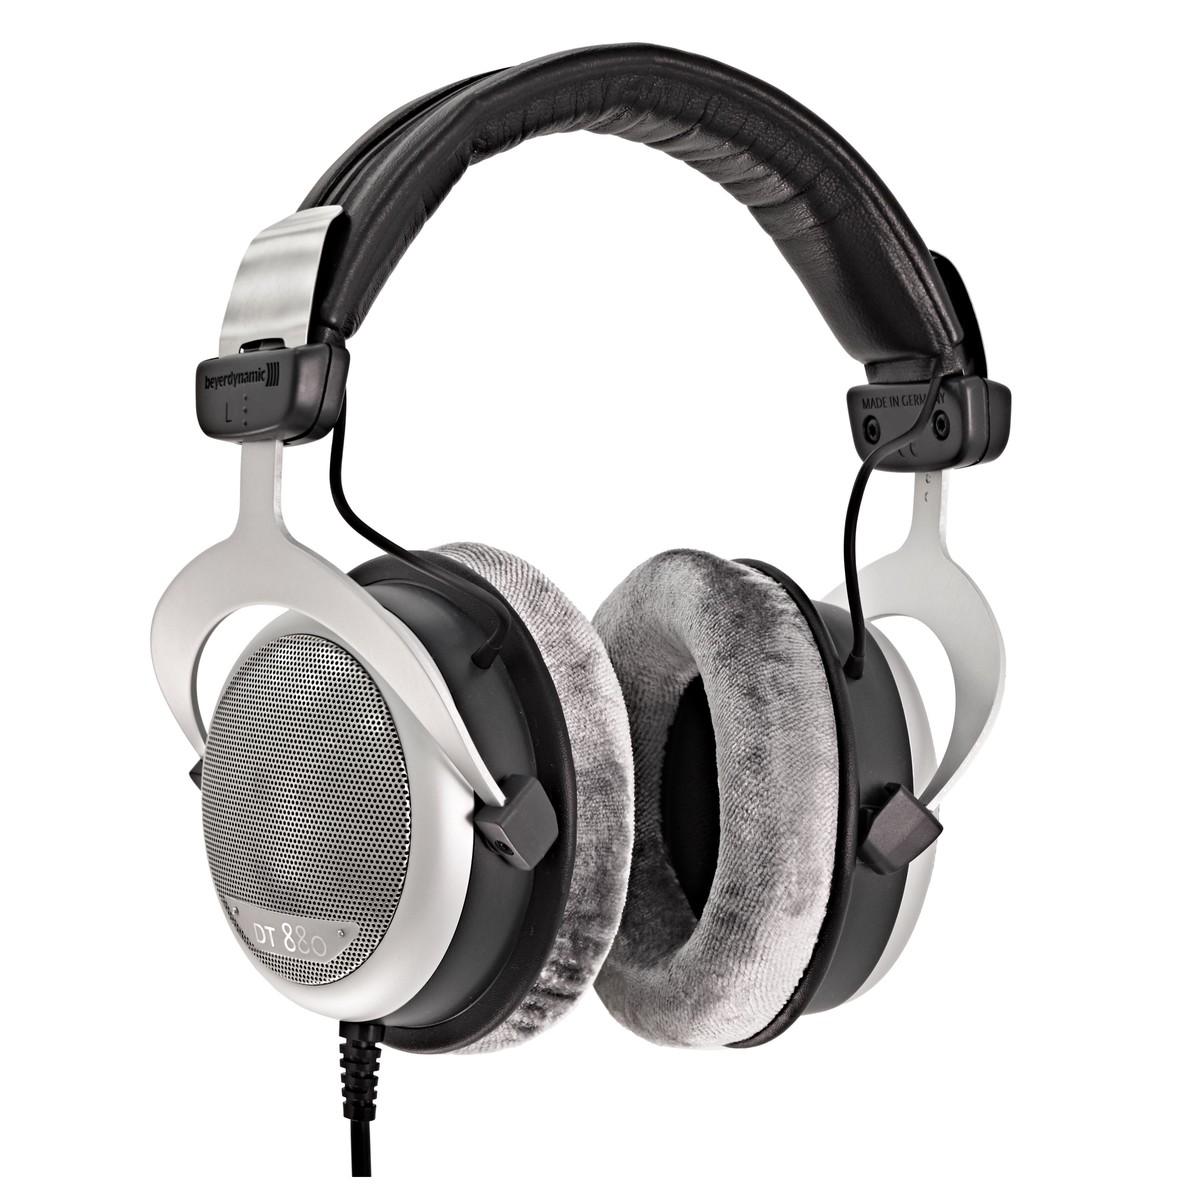 658dbe64ea4 Beyerdynamic DT 880 Edition Headphones, 600 Ohms main. Loading zoom